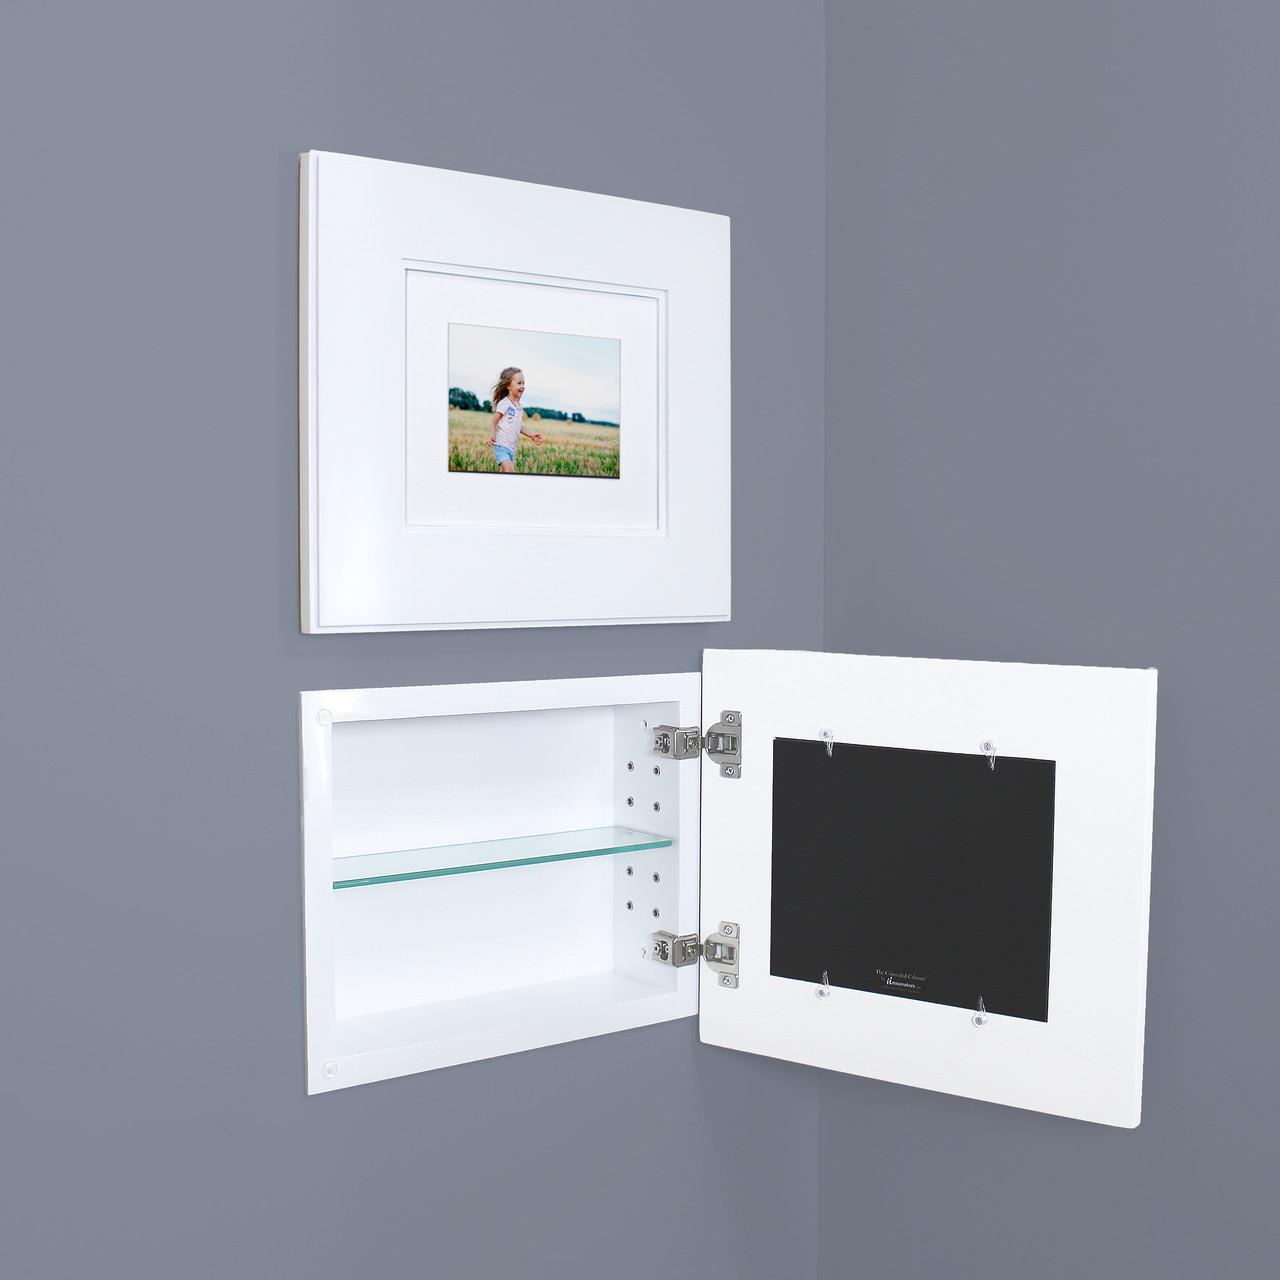 Landscape Shaker White Recessed Picture Frame Medicine Cabinet 14 W X 11 H